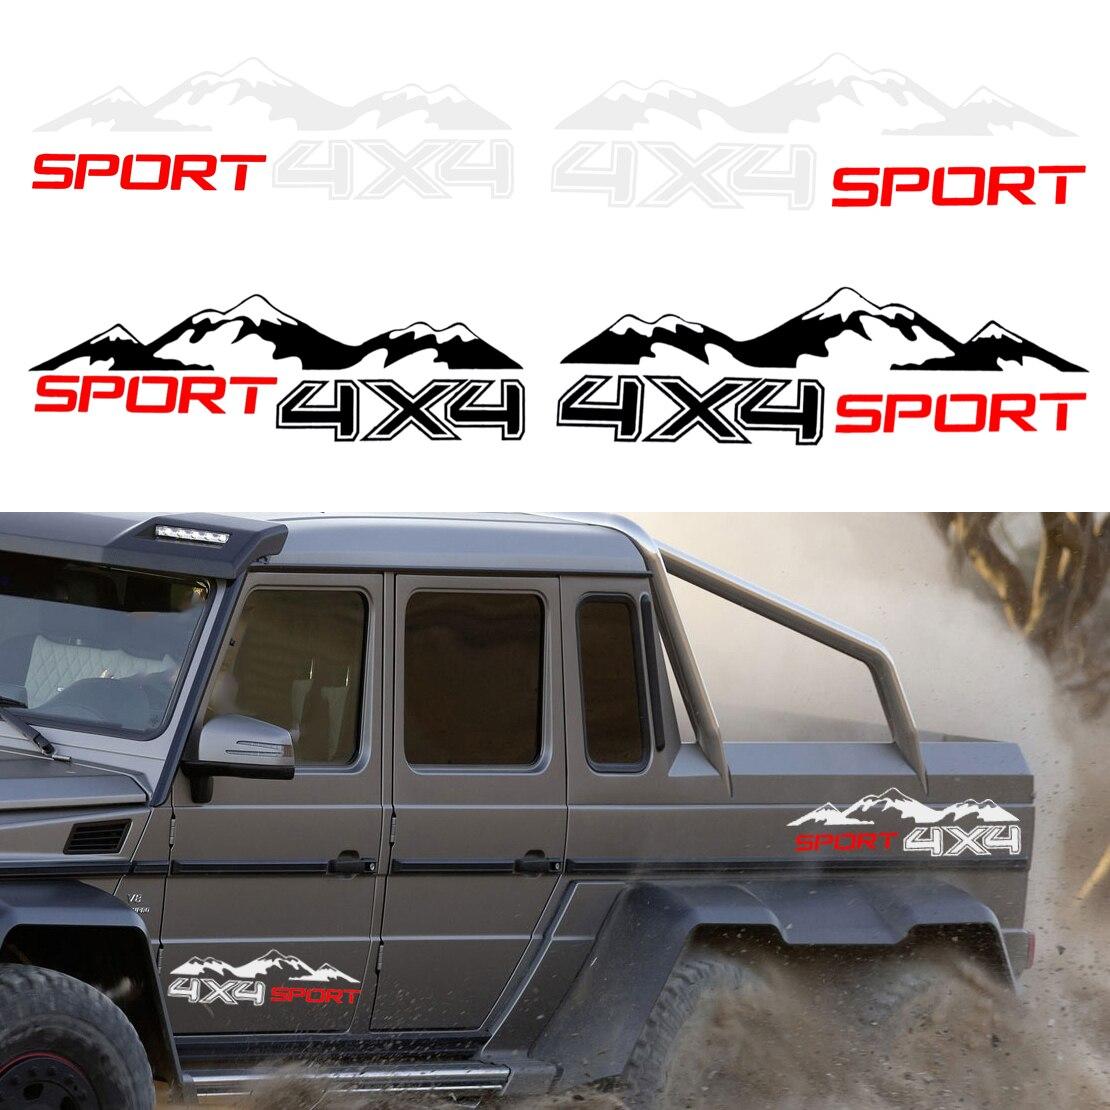 DIY 2Pcs 4x4 Sport Mountain Waterproof Vinyl Decal Sticker For Off Road Car SUV